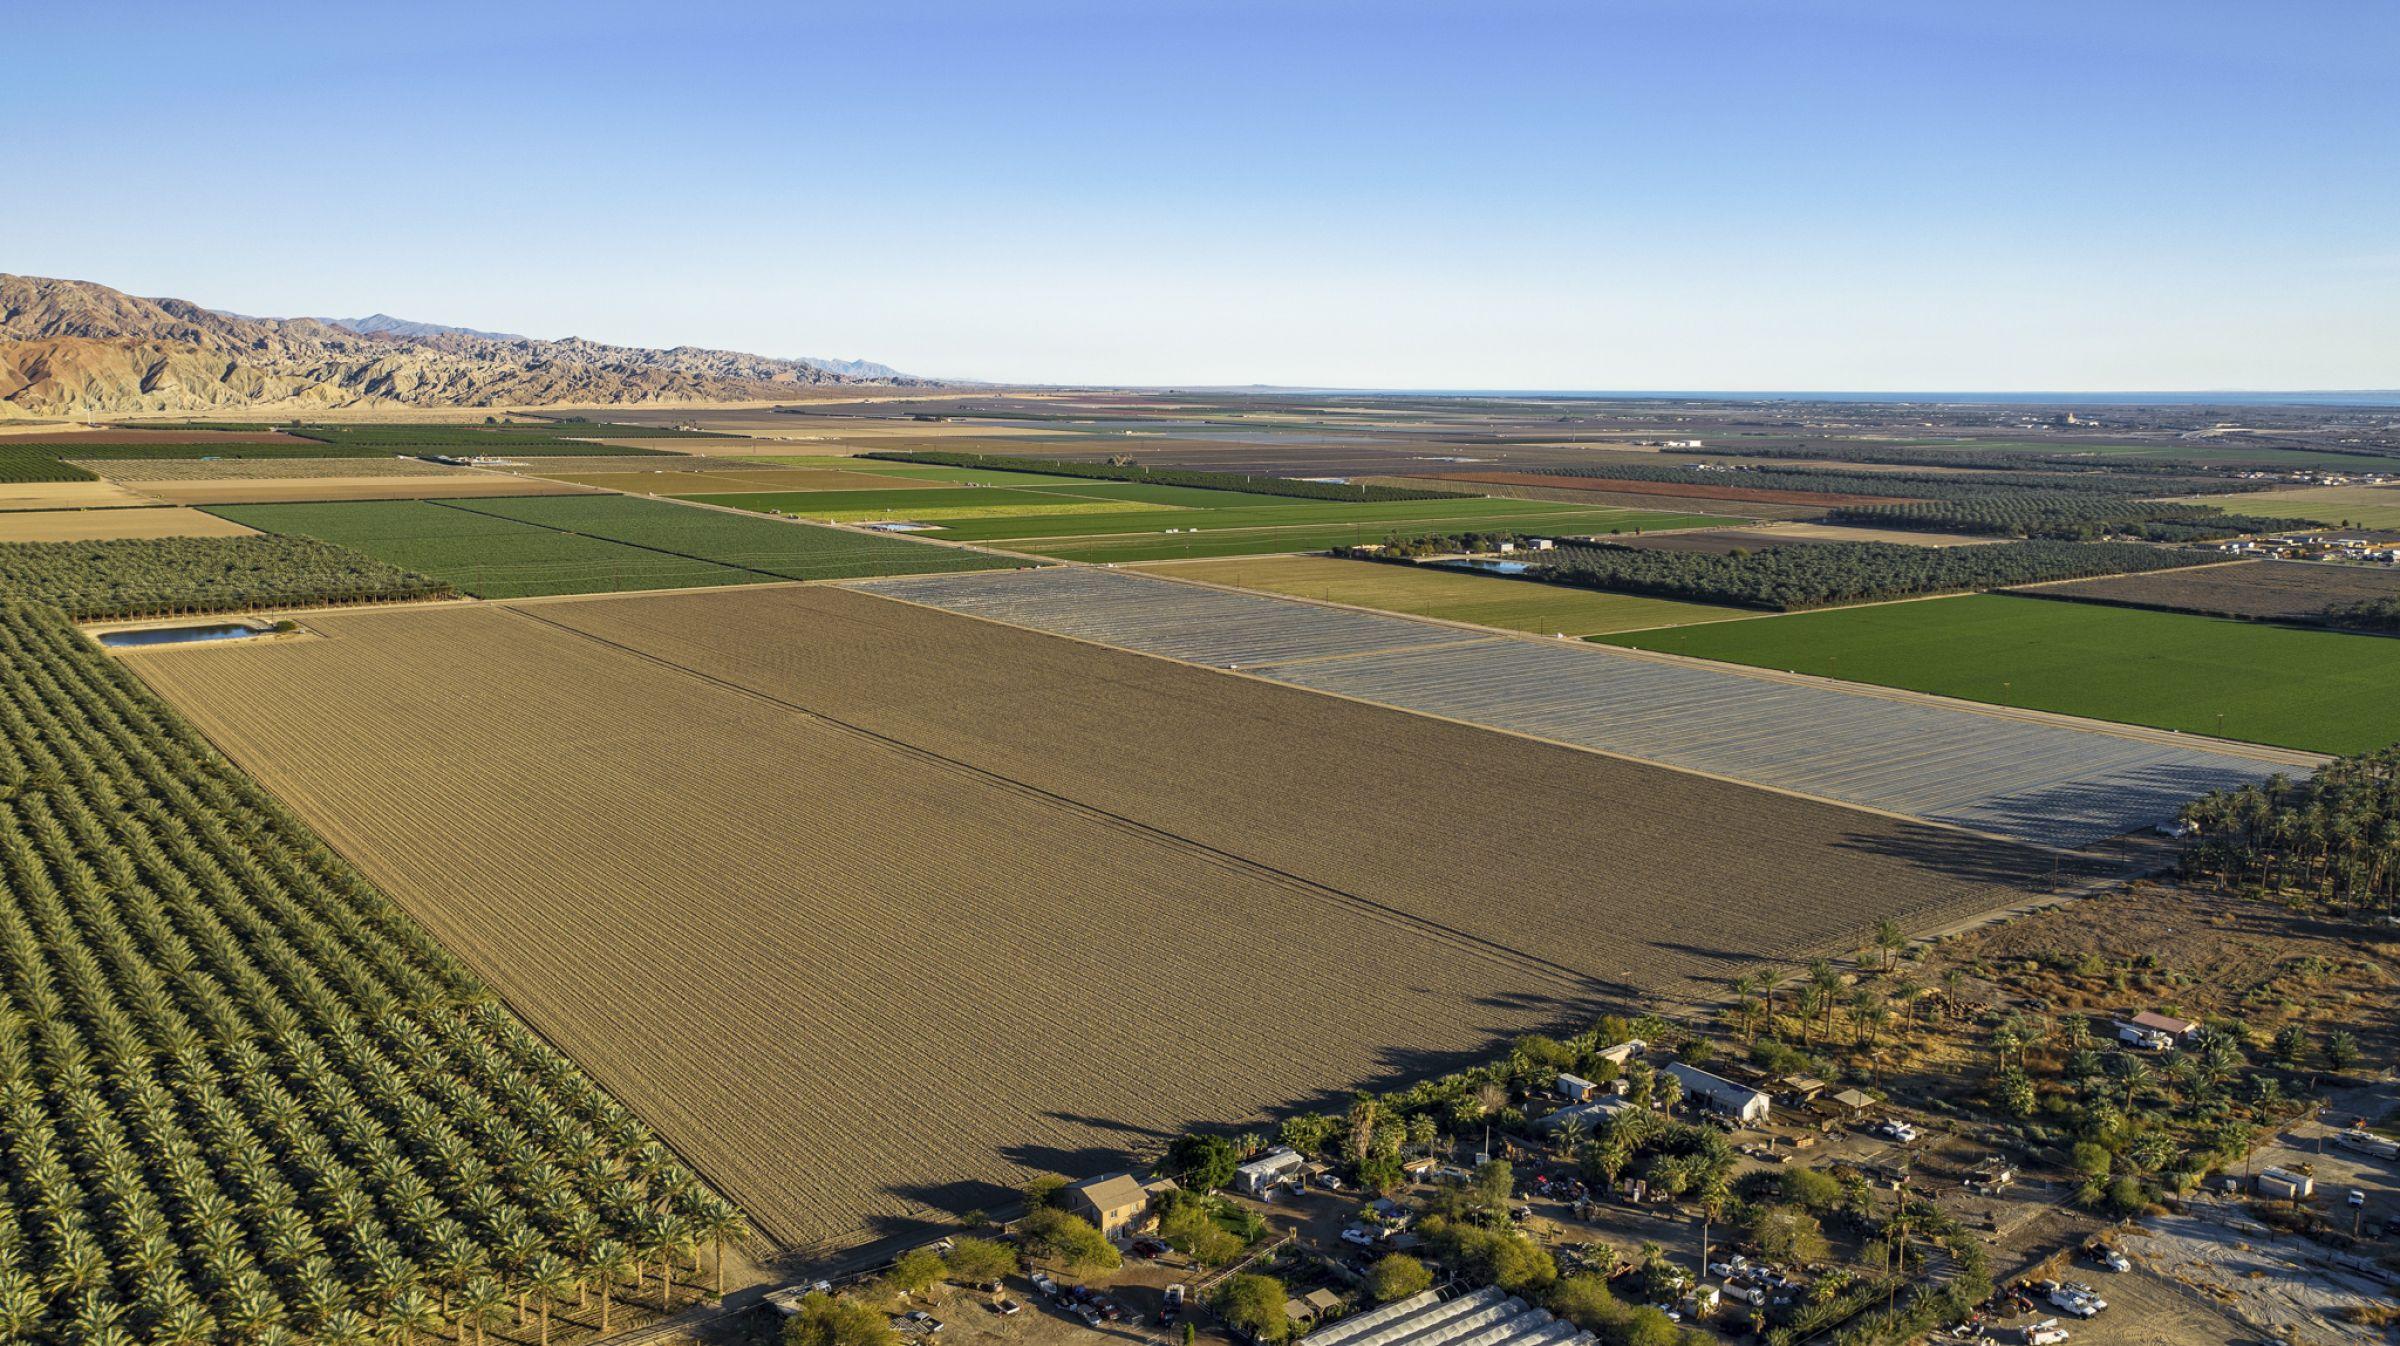 land-riverside-county-california-118-acres-listing-number-15577-0-2021-06-10-215351.jpg